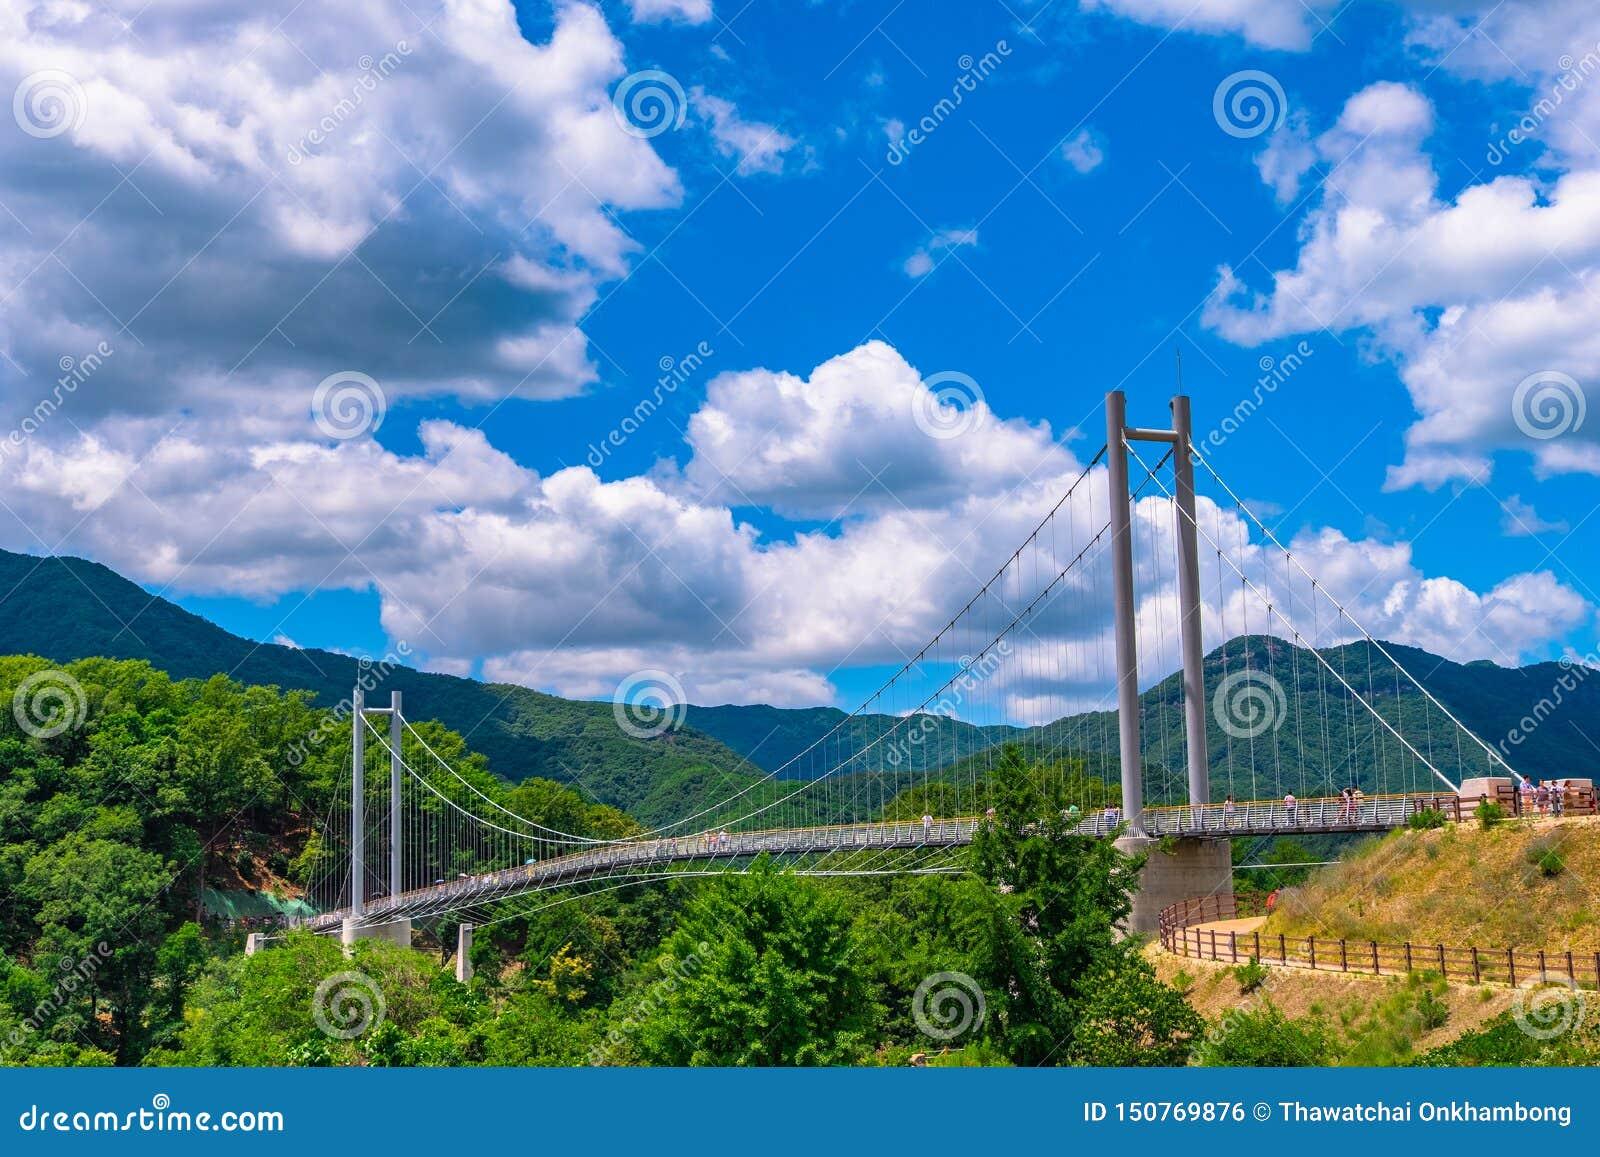 Атмосфера дневного времени на голубе Nang мост, Пхочхон Сеул Корея